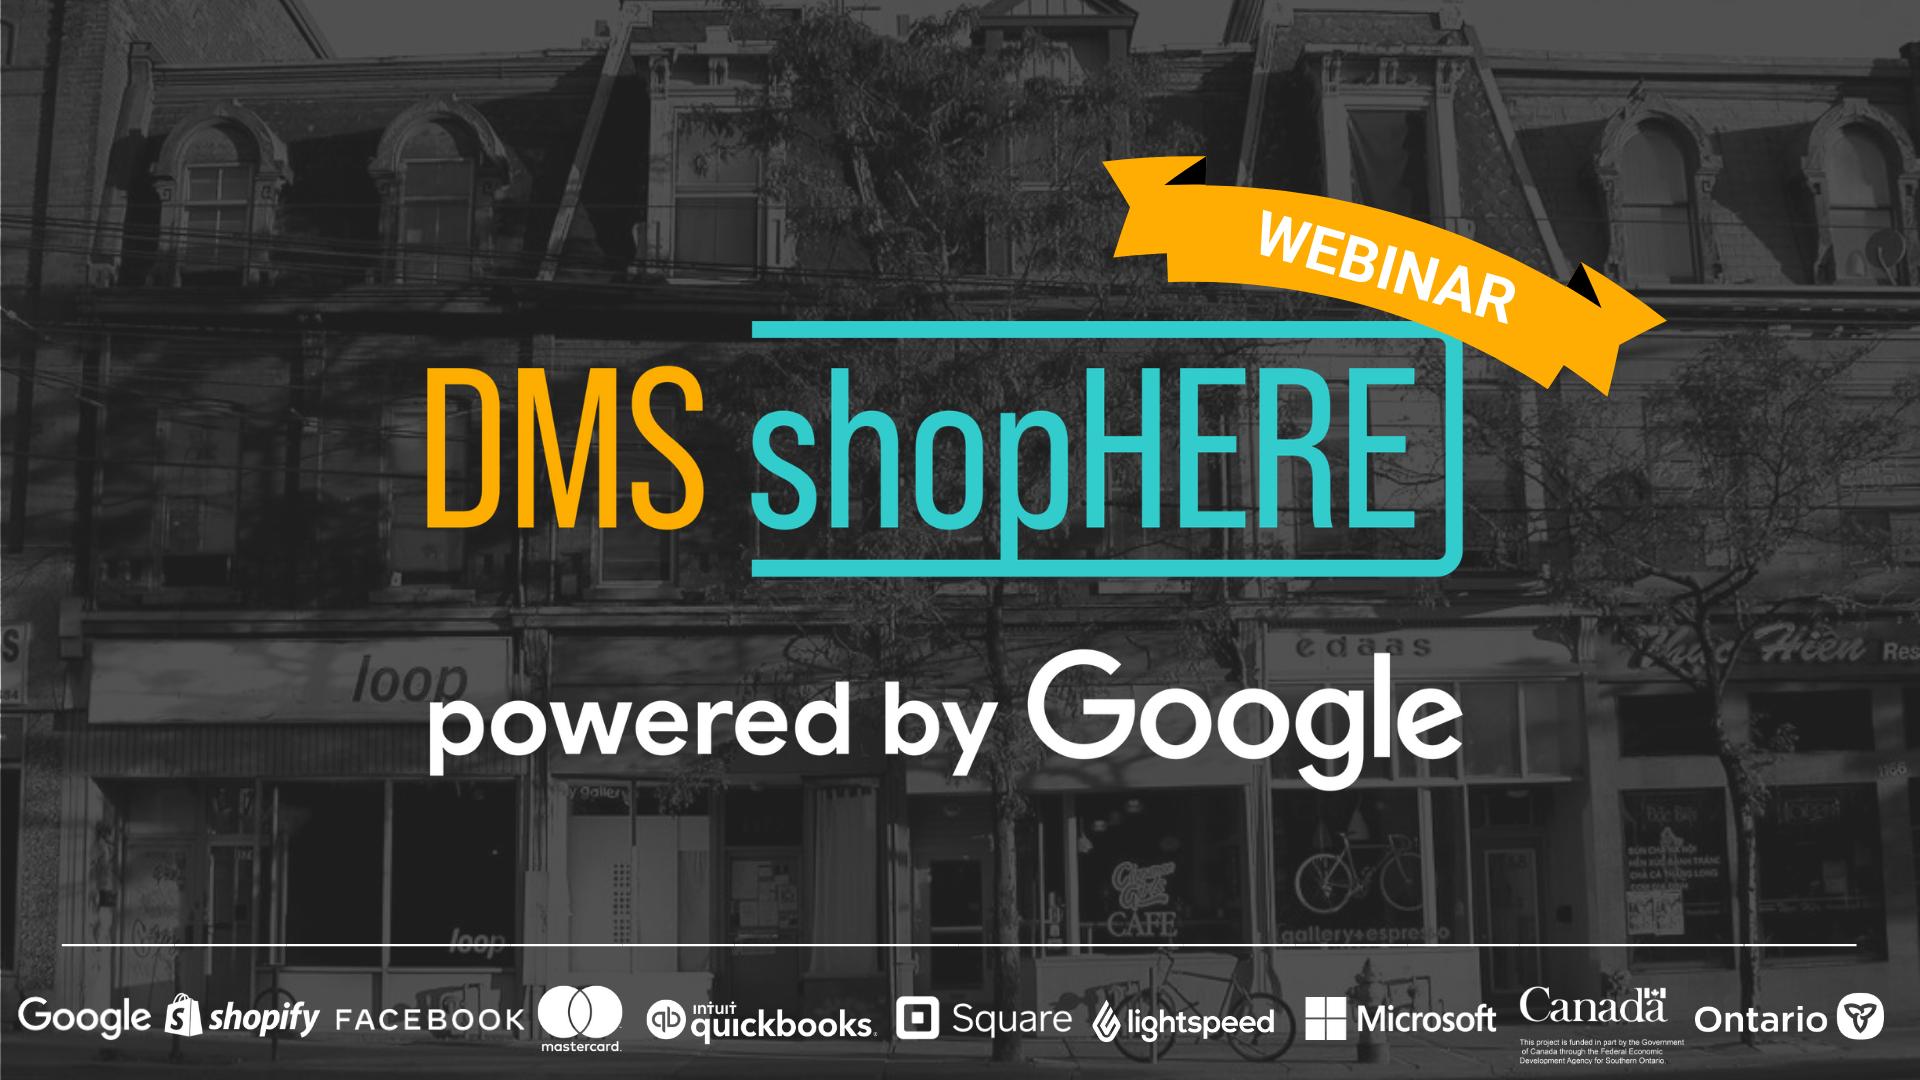 ShopHERE Powered By Google Webinar